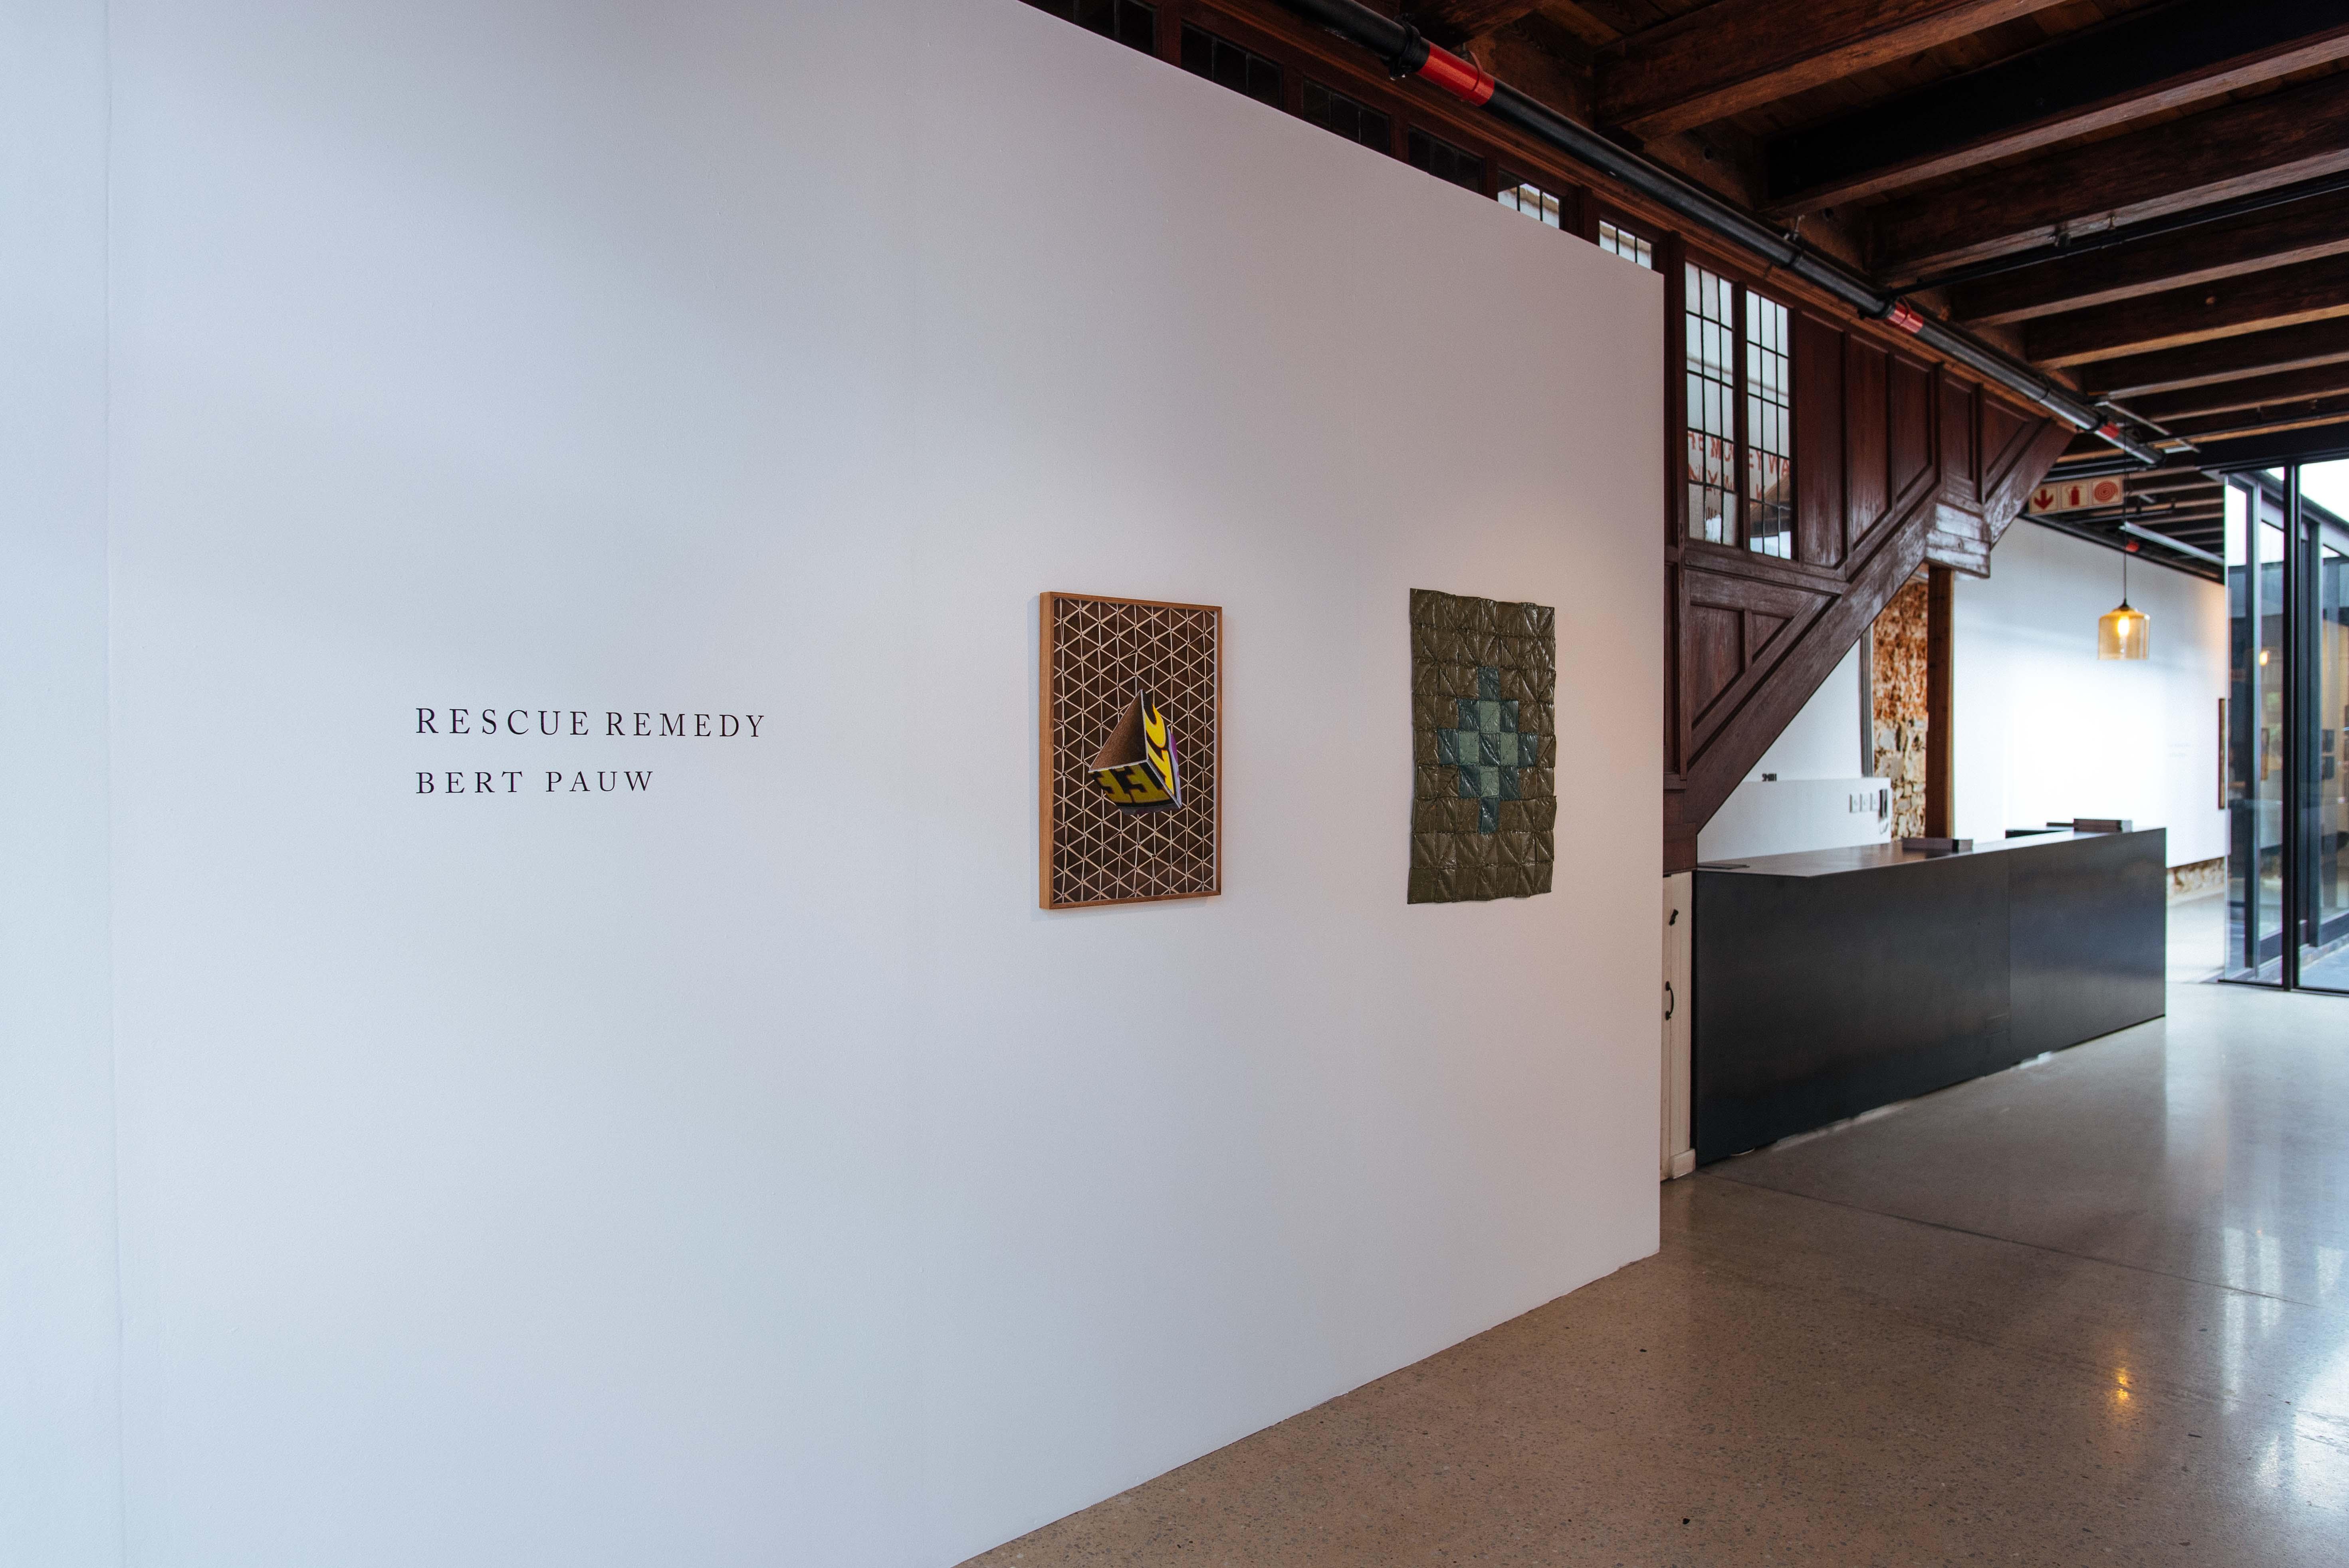 Bert Pauw Exhibition Entrance